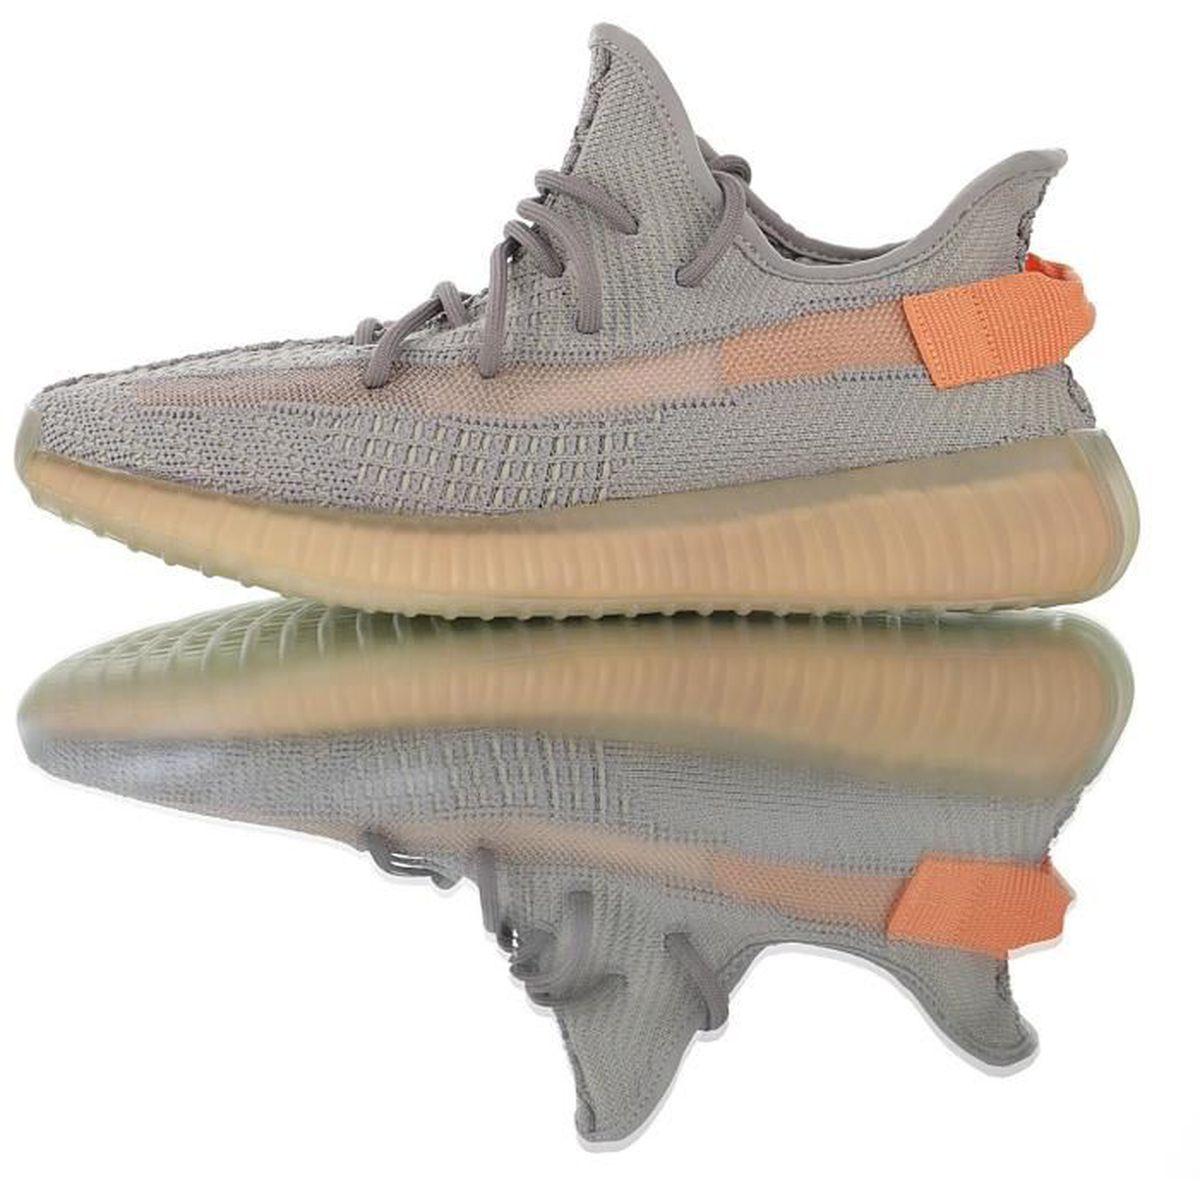 "Baskets Adidas Yeezy Boost 350 V2 ""True Form""Chaussures de ..."